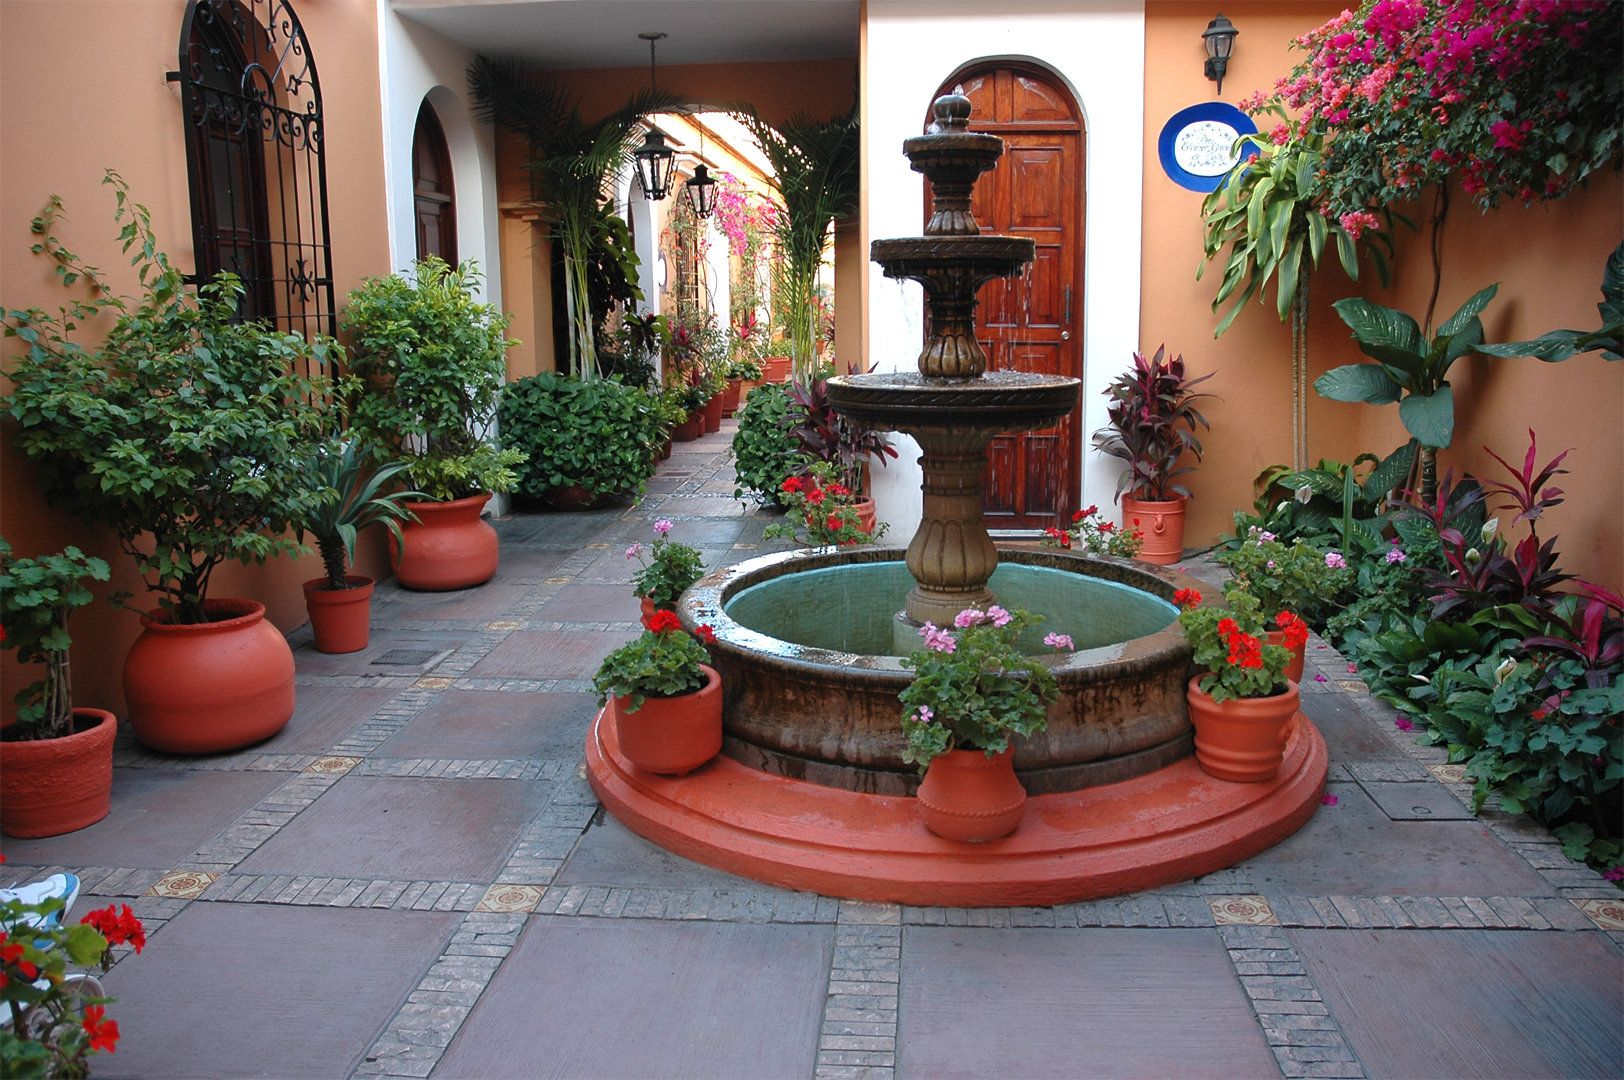 patios mexicanos by alejandraferrar on Pinterest | Mexican ... on Mexican Backyard Decor id=78736